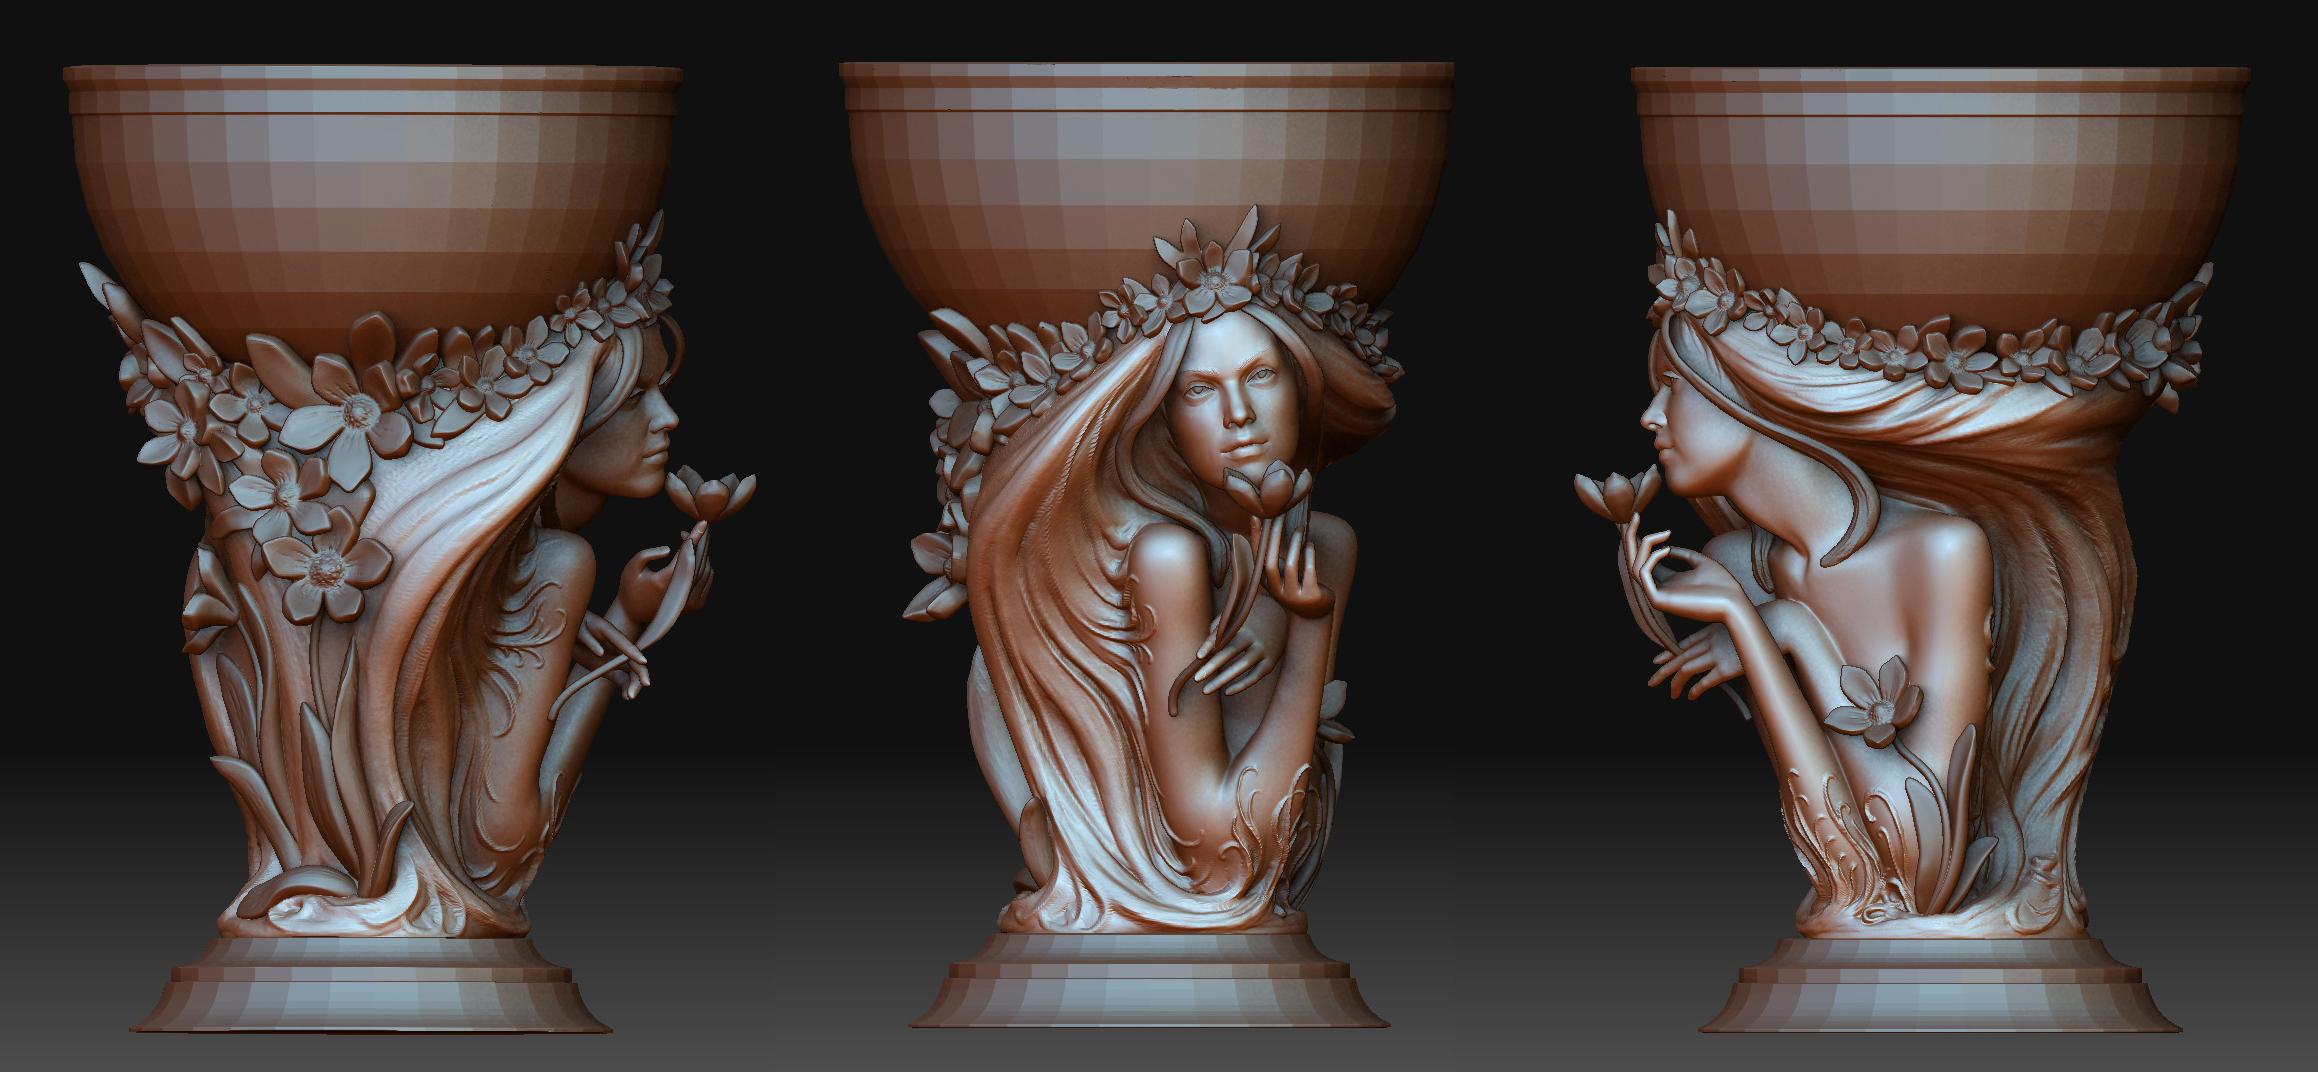 digital sculptures by Max Bespalov at Coroflot.com